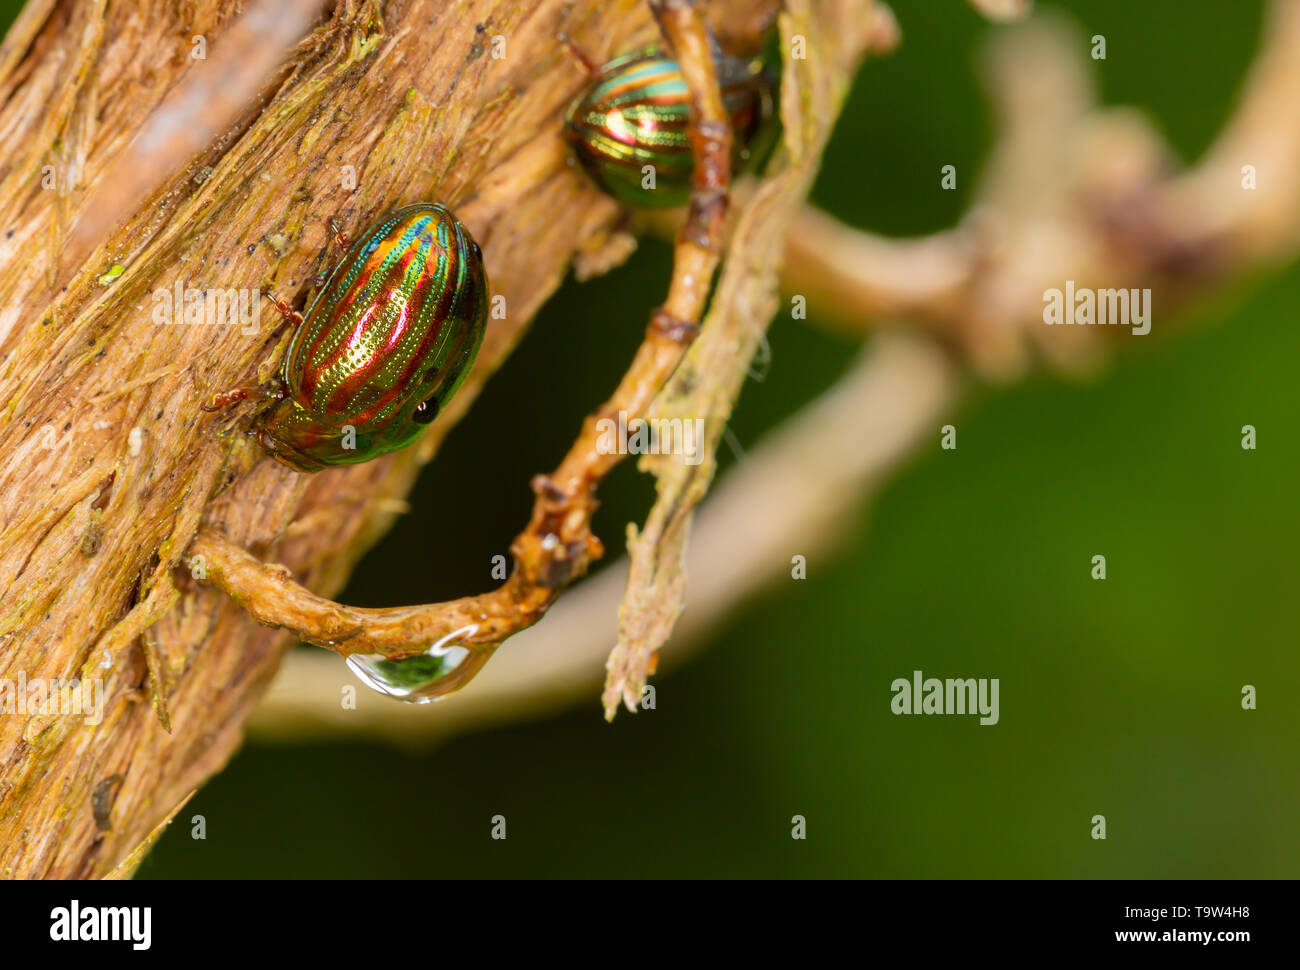 Macro photo of Rosemary Beetle on stripped Rosemary bush on green background. - Stock Image